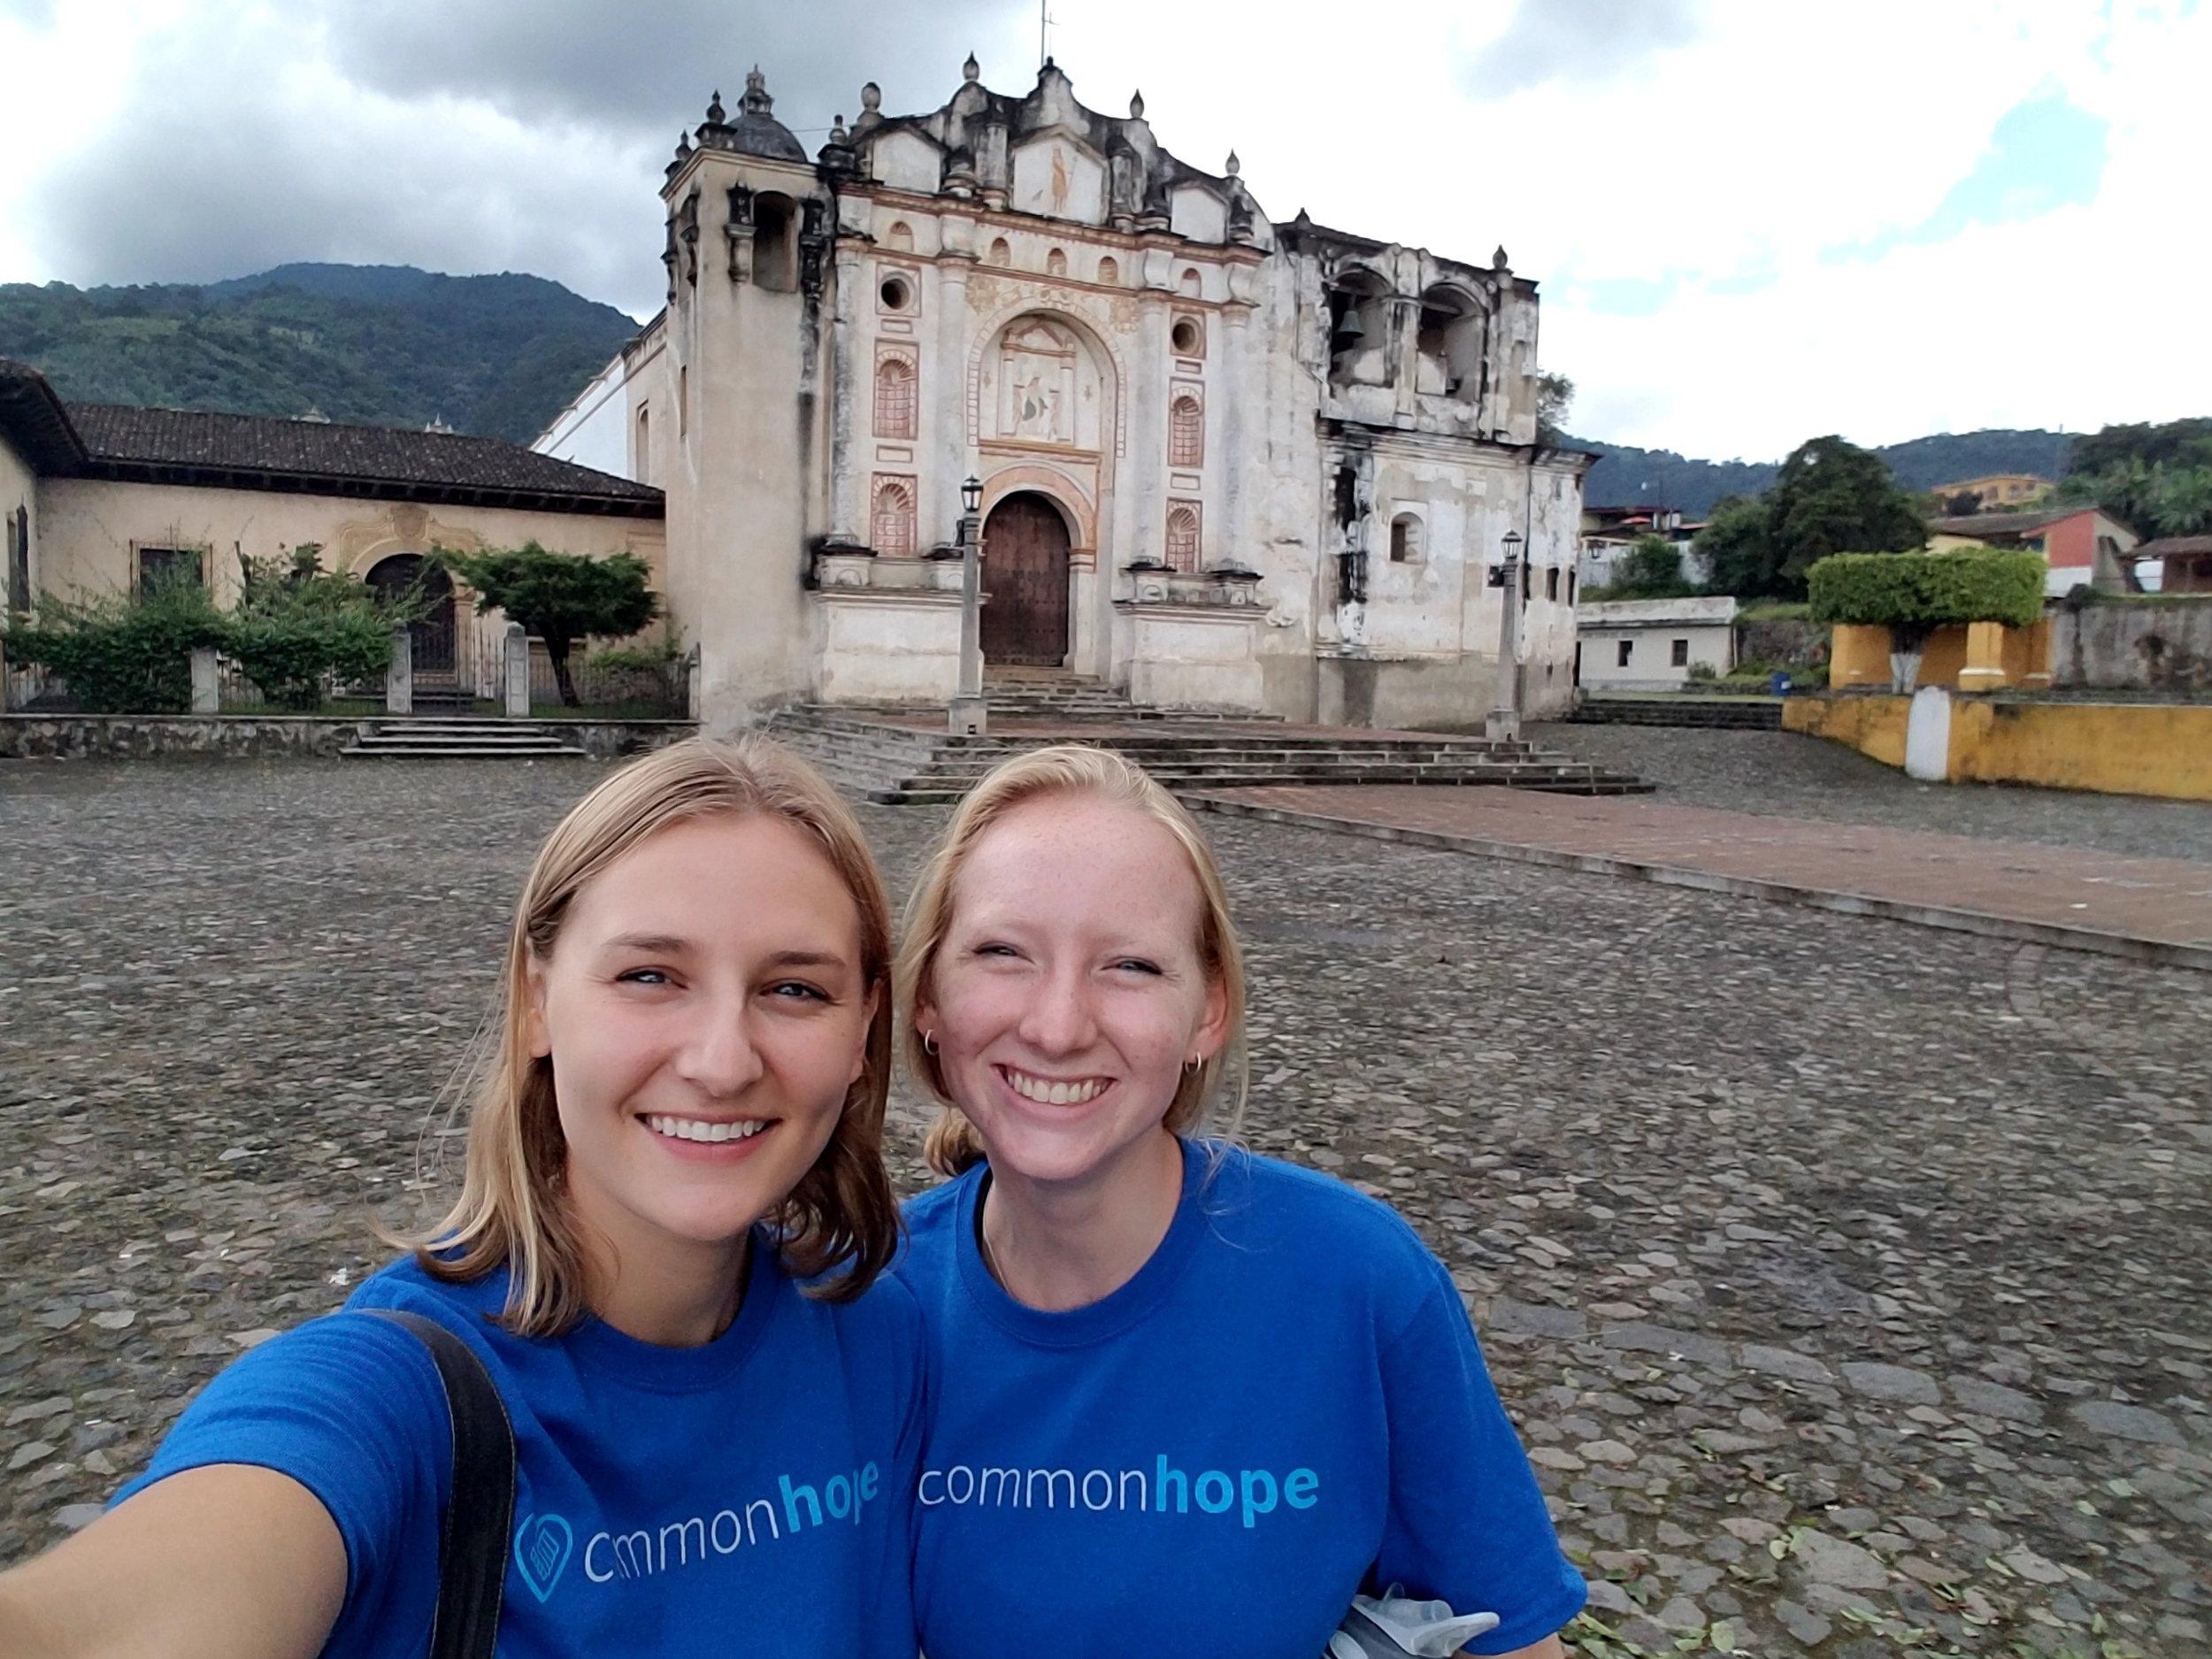 Team members exploring the local sights of Antigua, Guatemala.